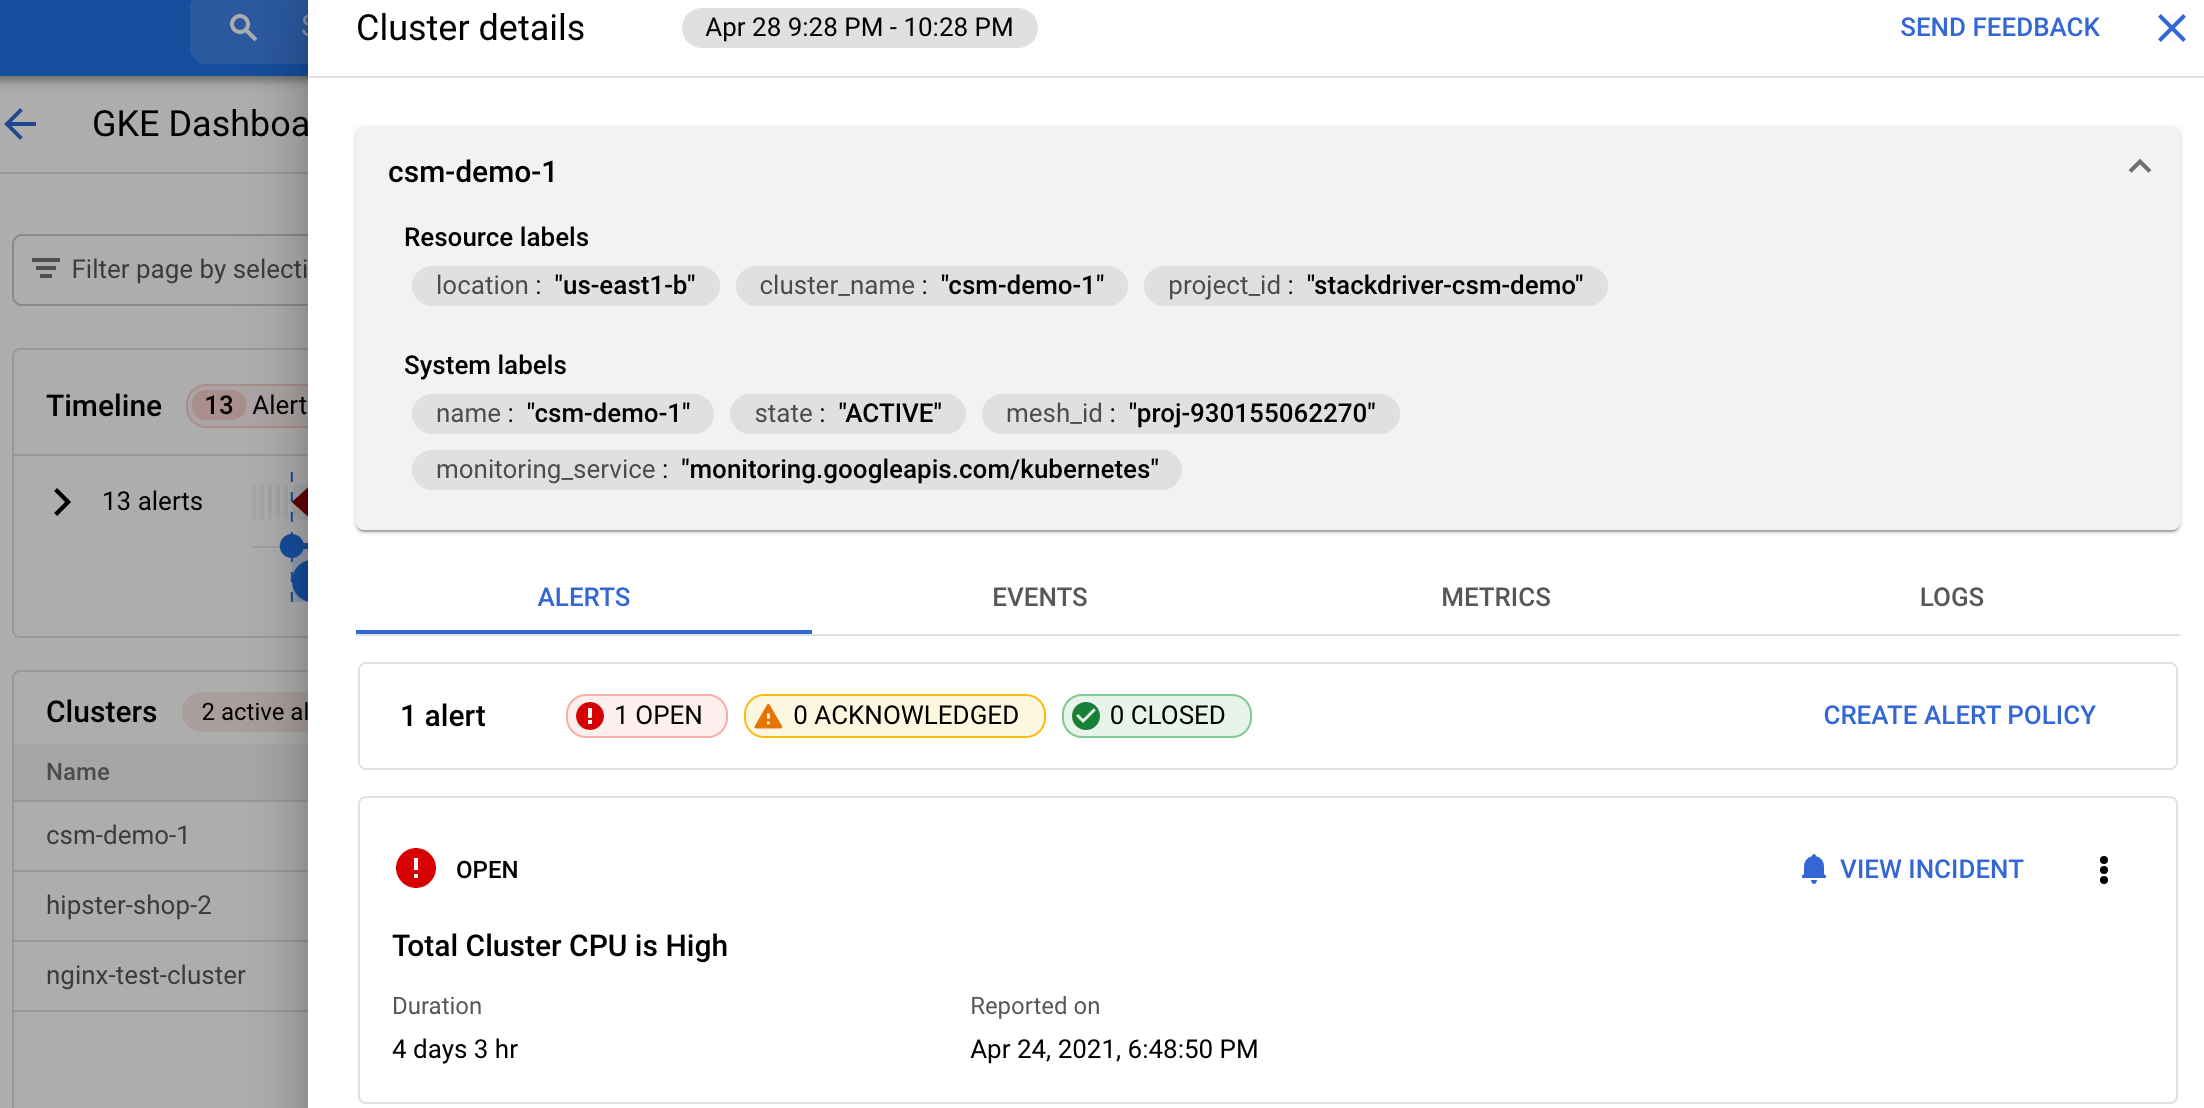 Display of a Kubernetes alerts details.